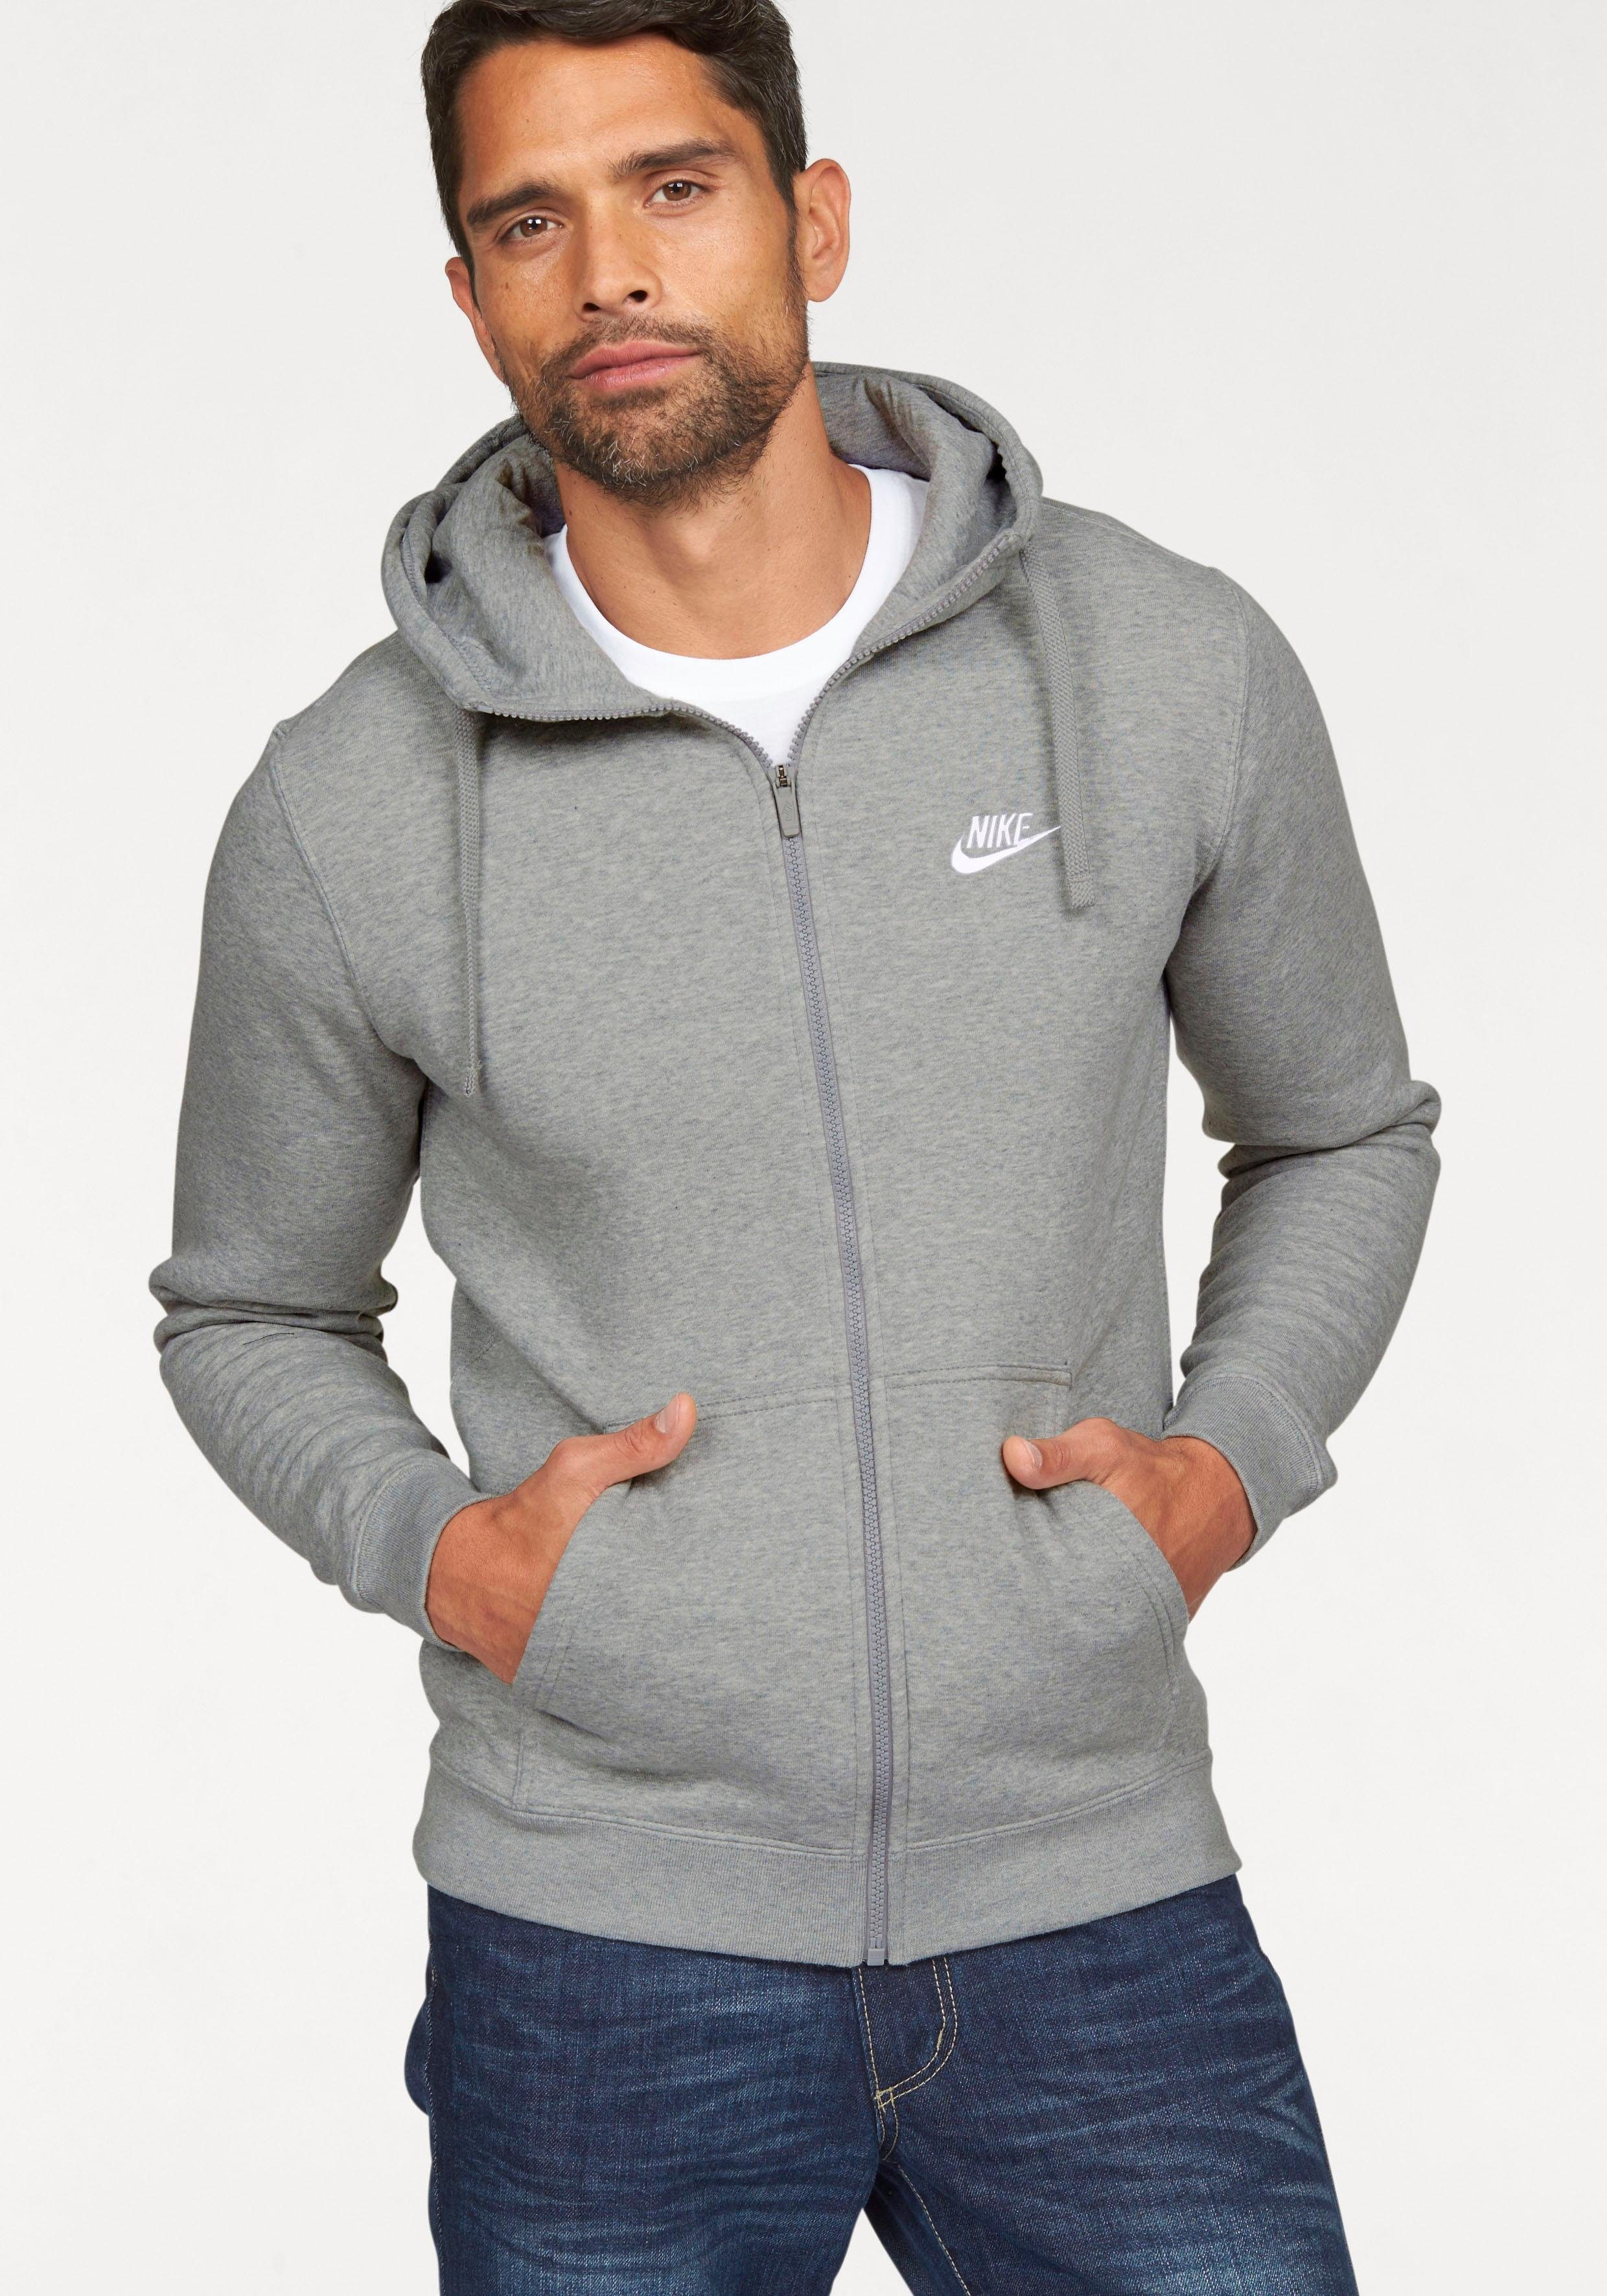 Nike Sportswear Kapuzensweatjacke »NSW HOODIE FULLZIP FLEECE CLUB« online kaufen | OTTO